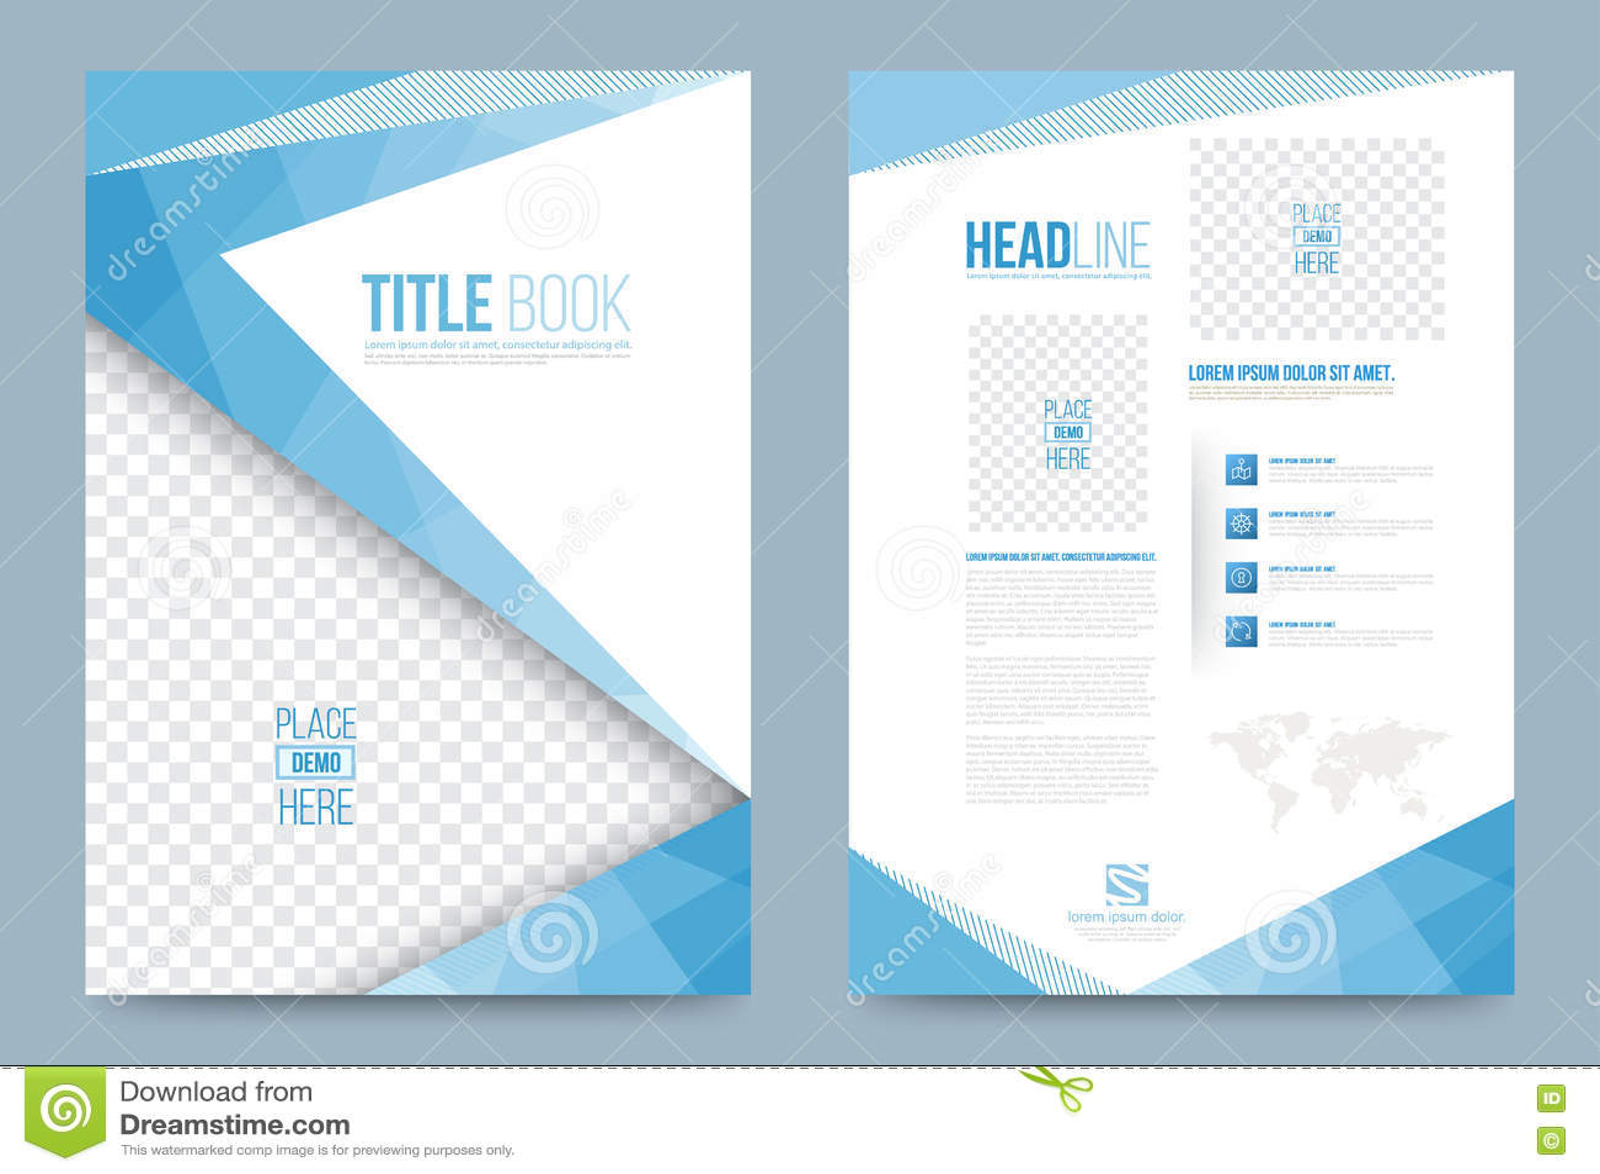 printing press brochure template - template design stock vector illustration of magazine